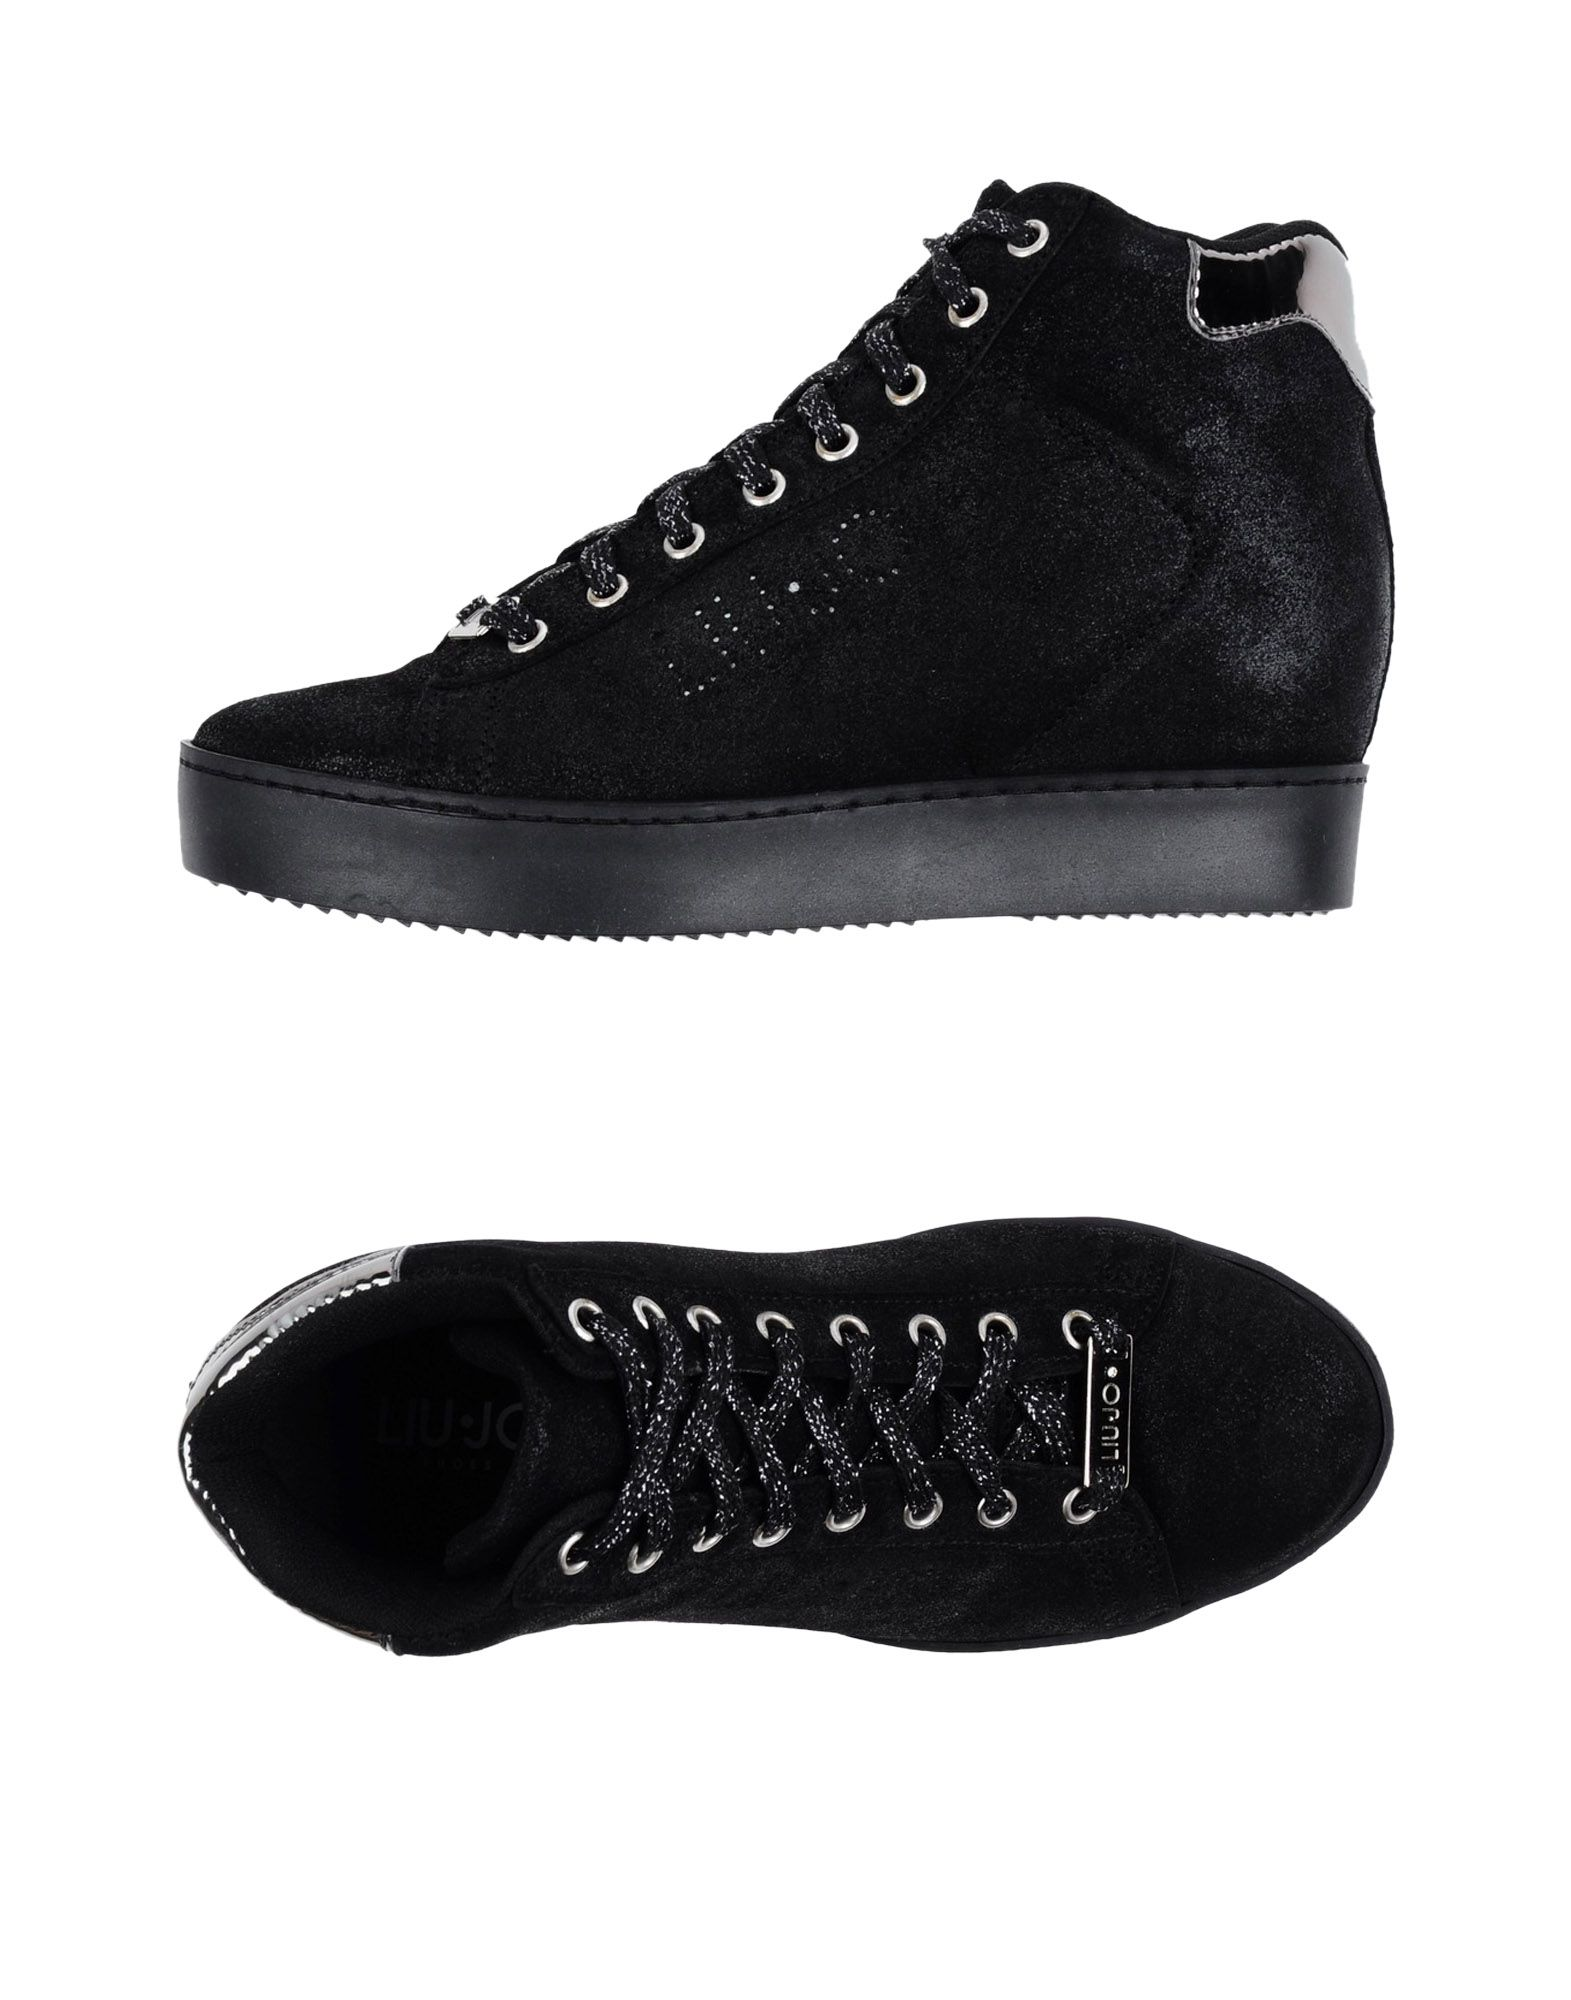 Liu •Jo Shoes Sneakers Damen  11248588NU Gute Qualität beliebte Schuhe